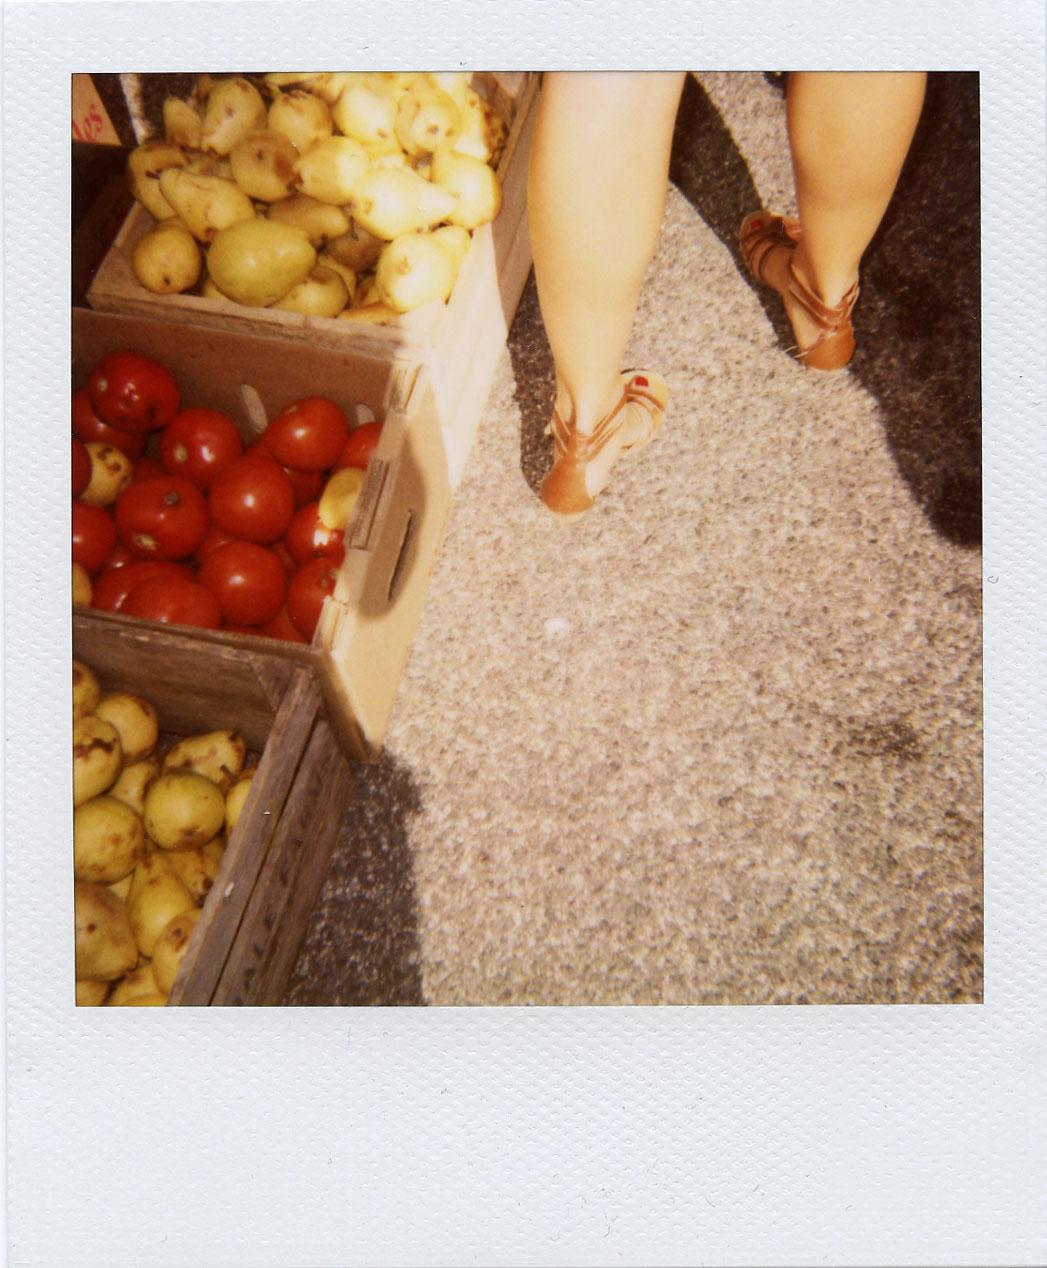 pola: legs